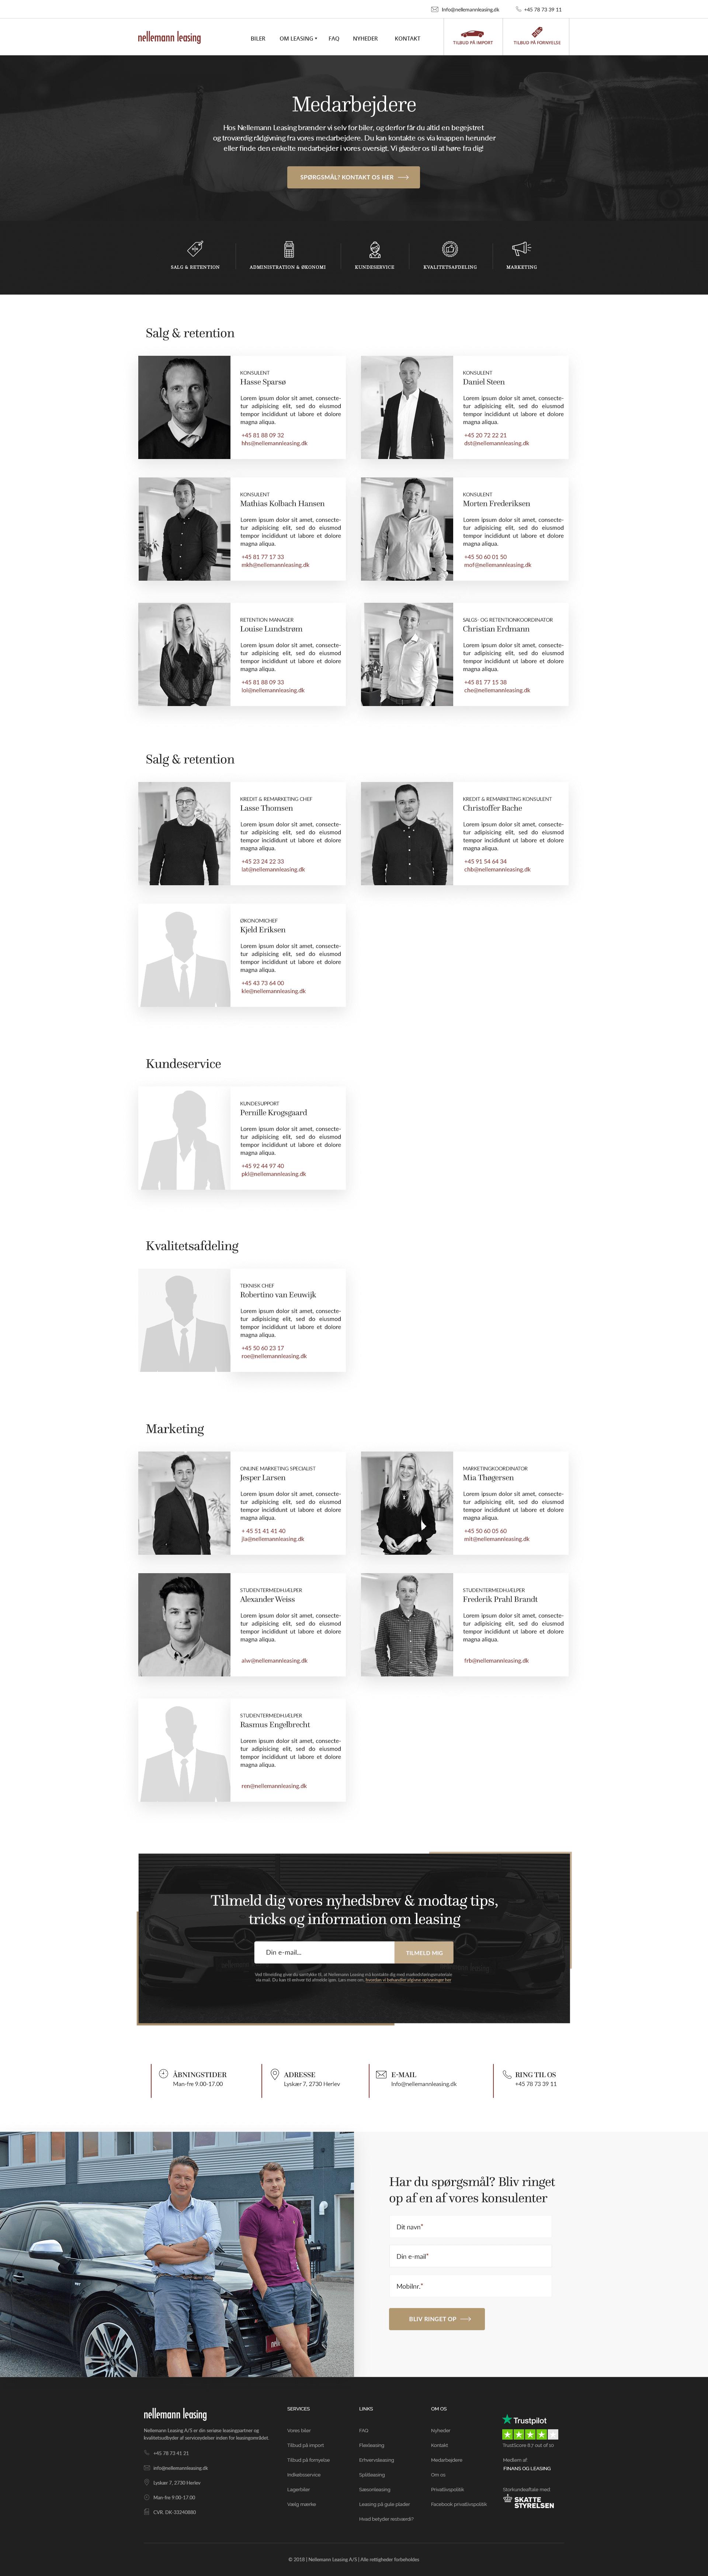 Webdesign medarbejderside - Nellemann Leasing